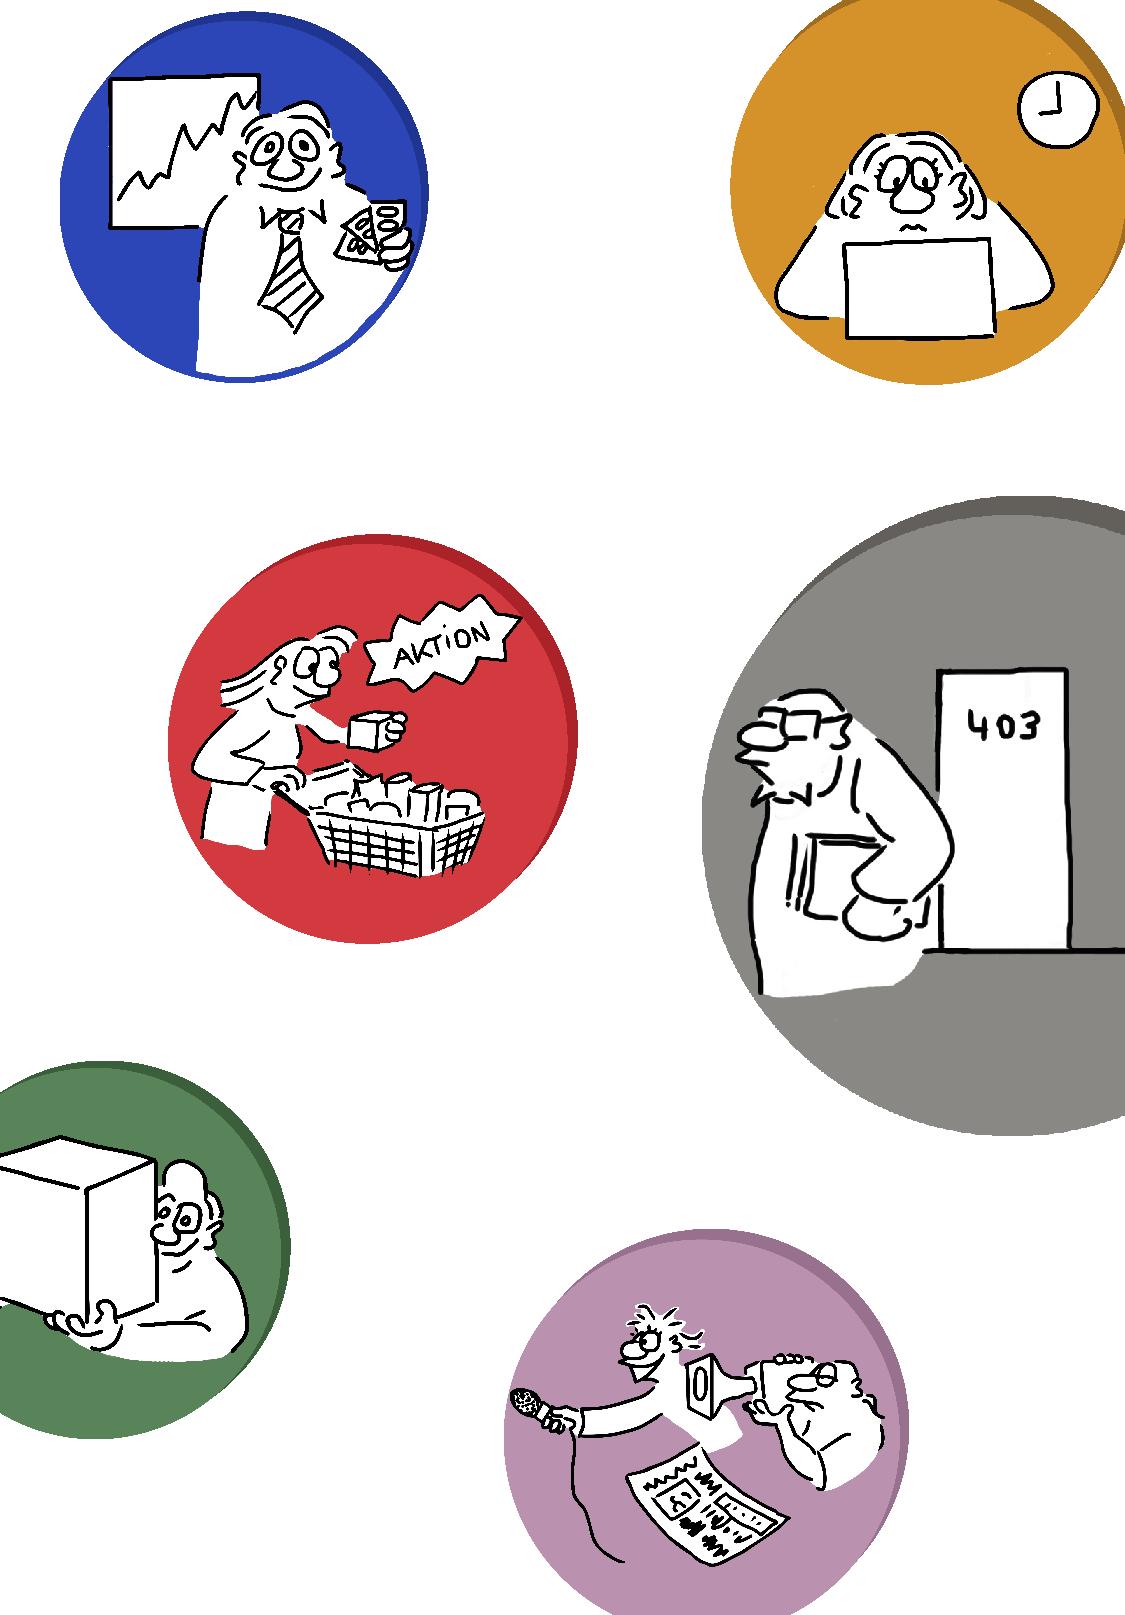 CSR Cartoons Icons Image 1